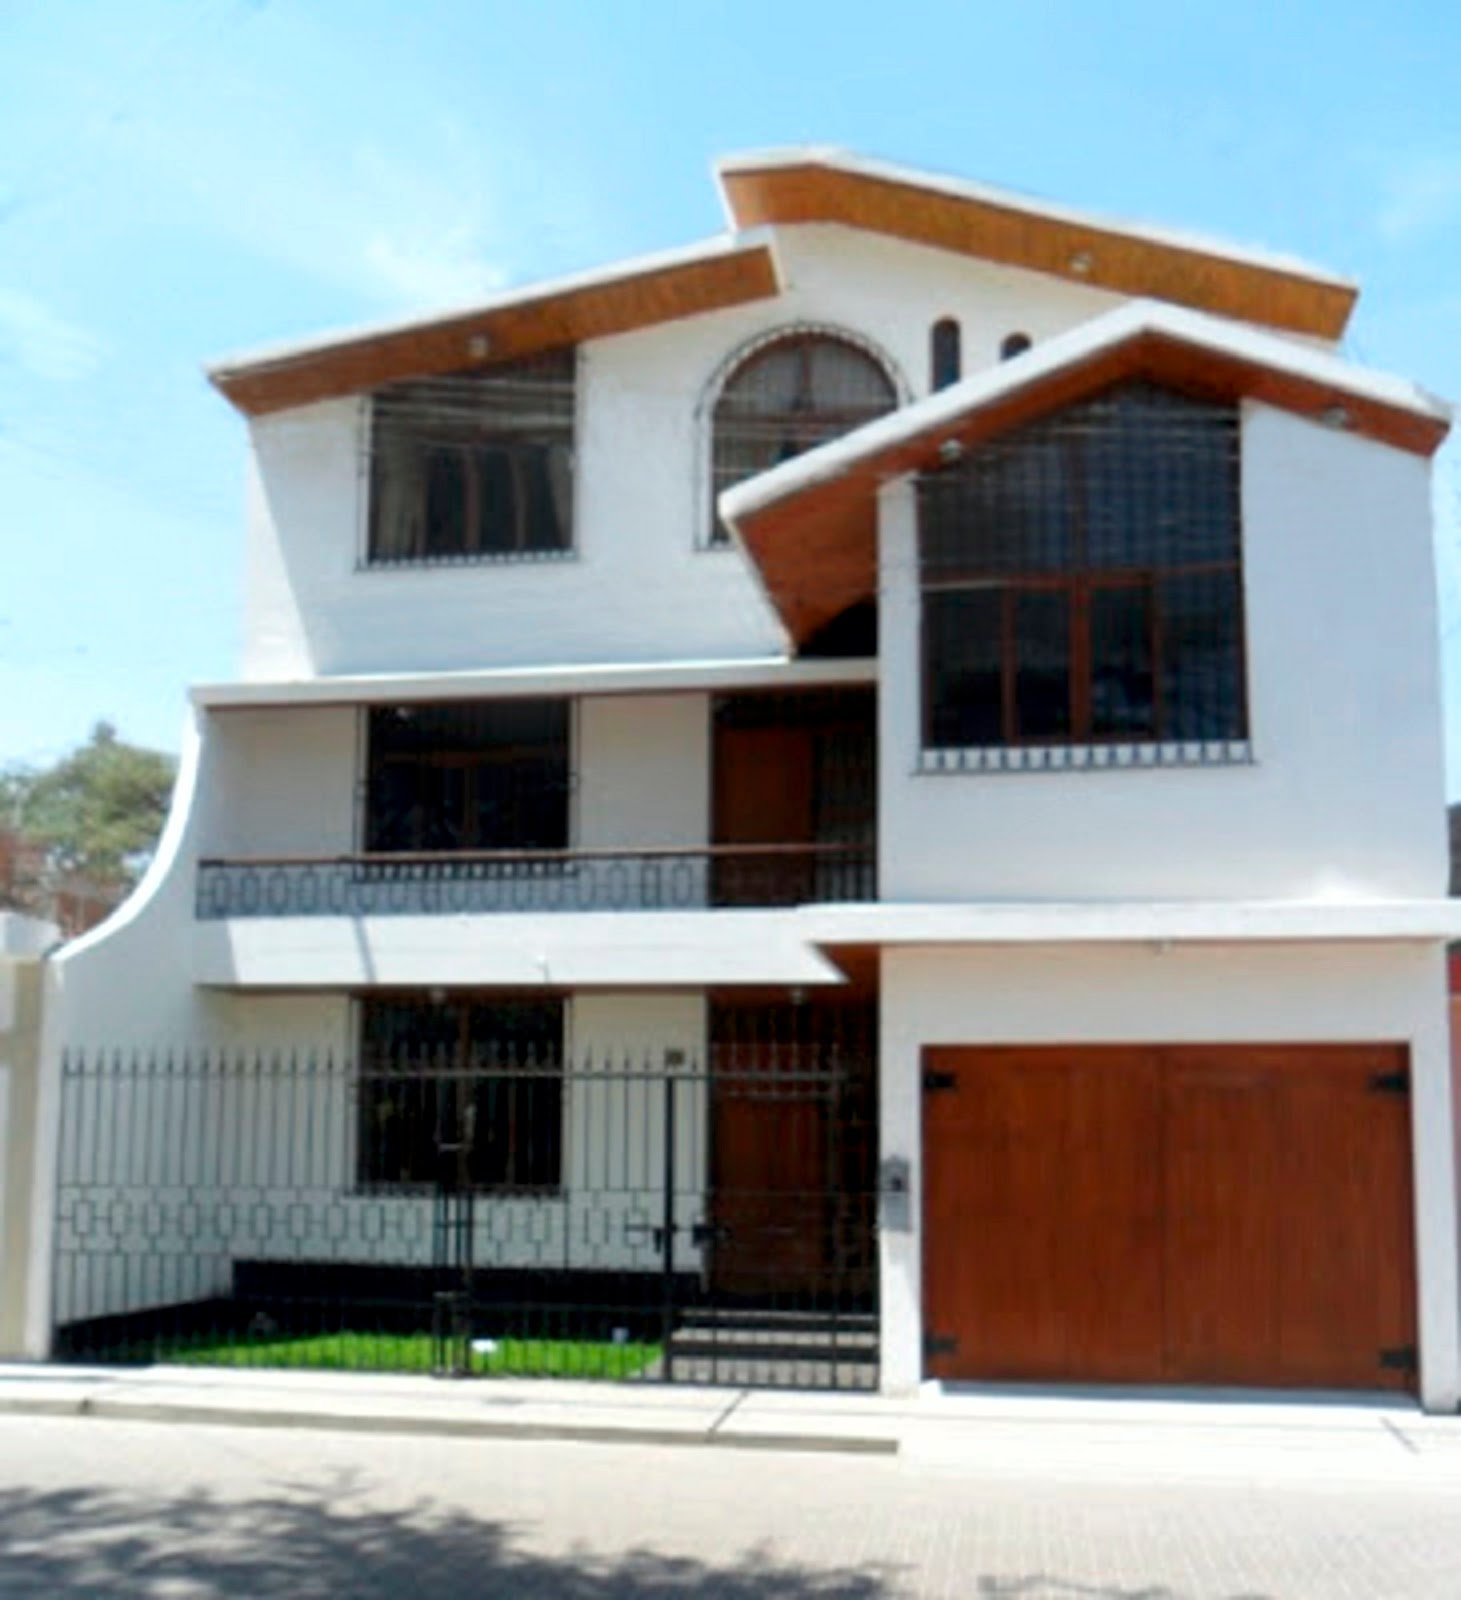 Fachadas y casas for Fachadas de casas de tres pisos